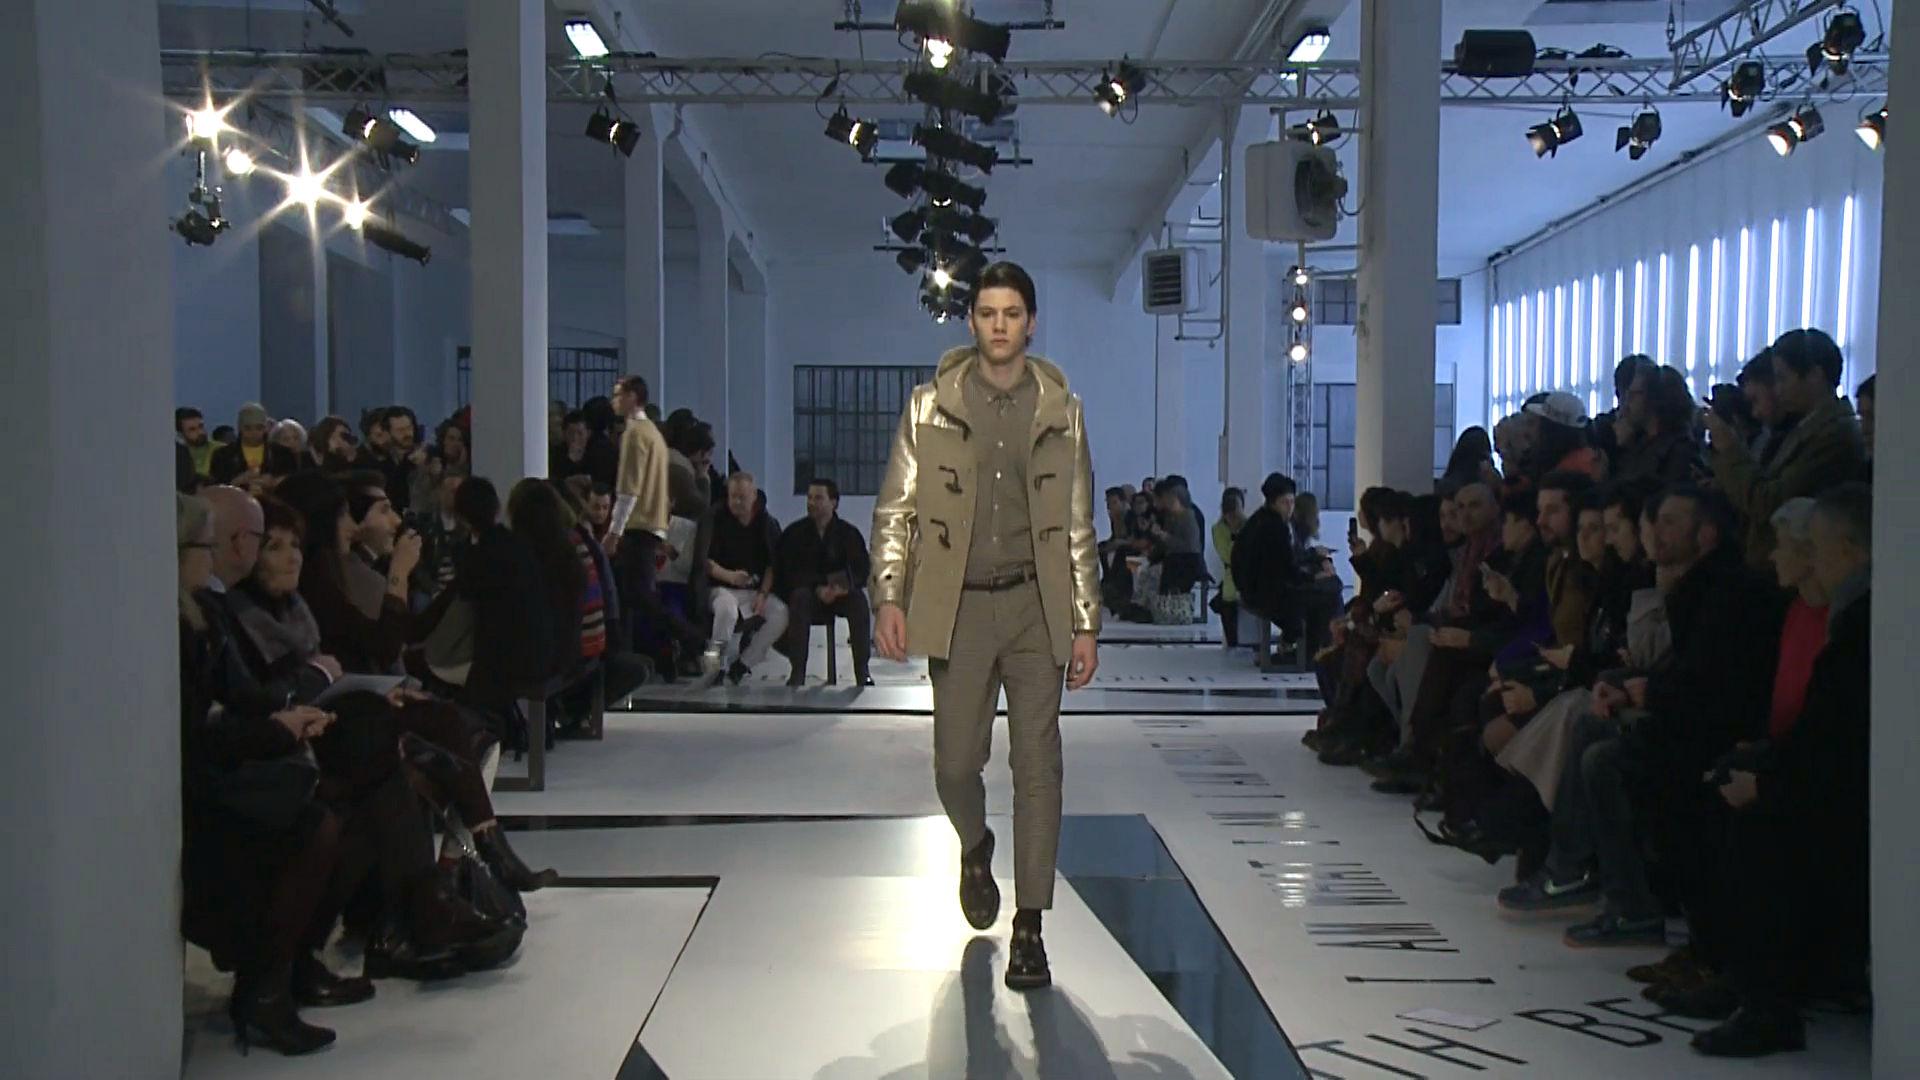 Msgm Fall Winter 2014-15 Men's Fashion Show - Milano Fashion Week